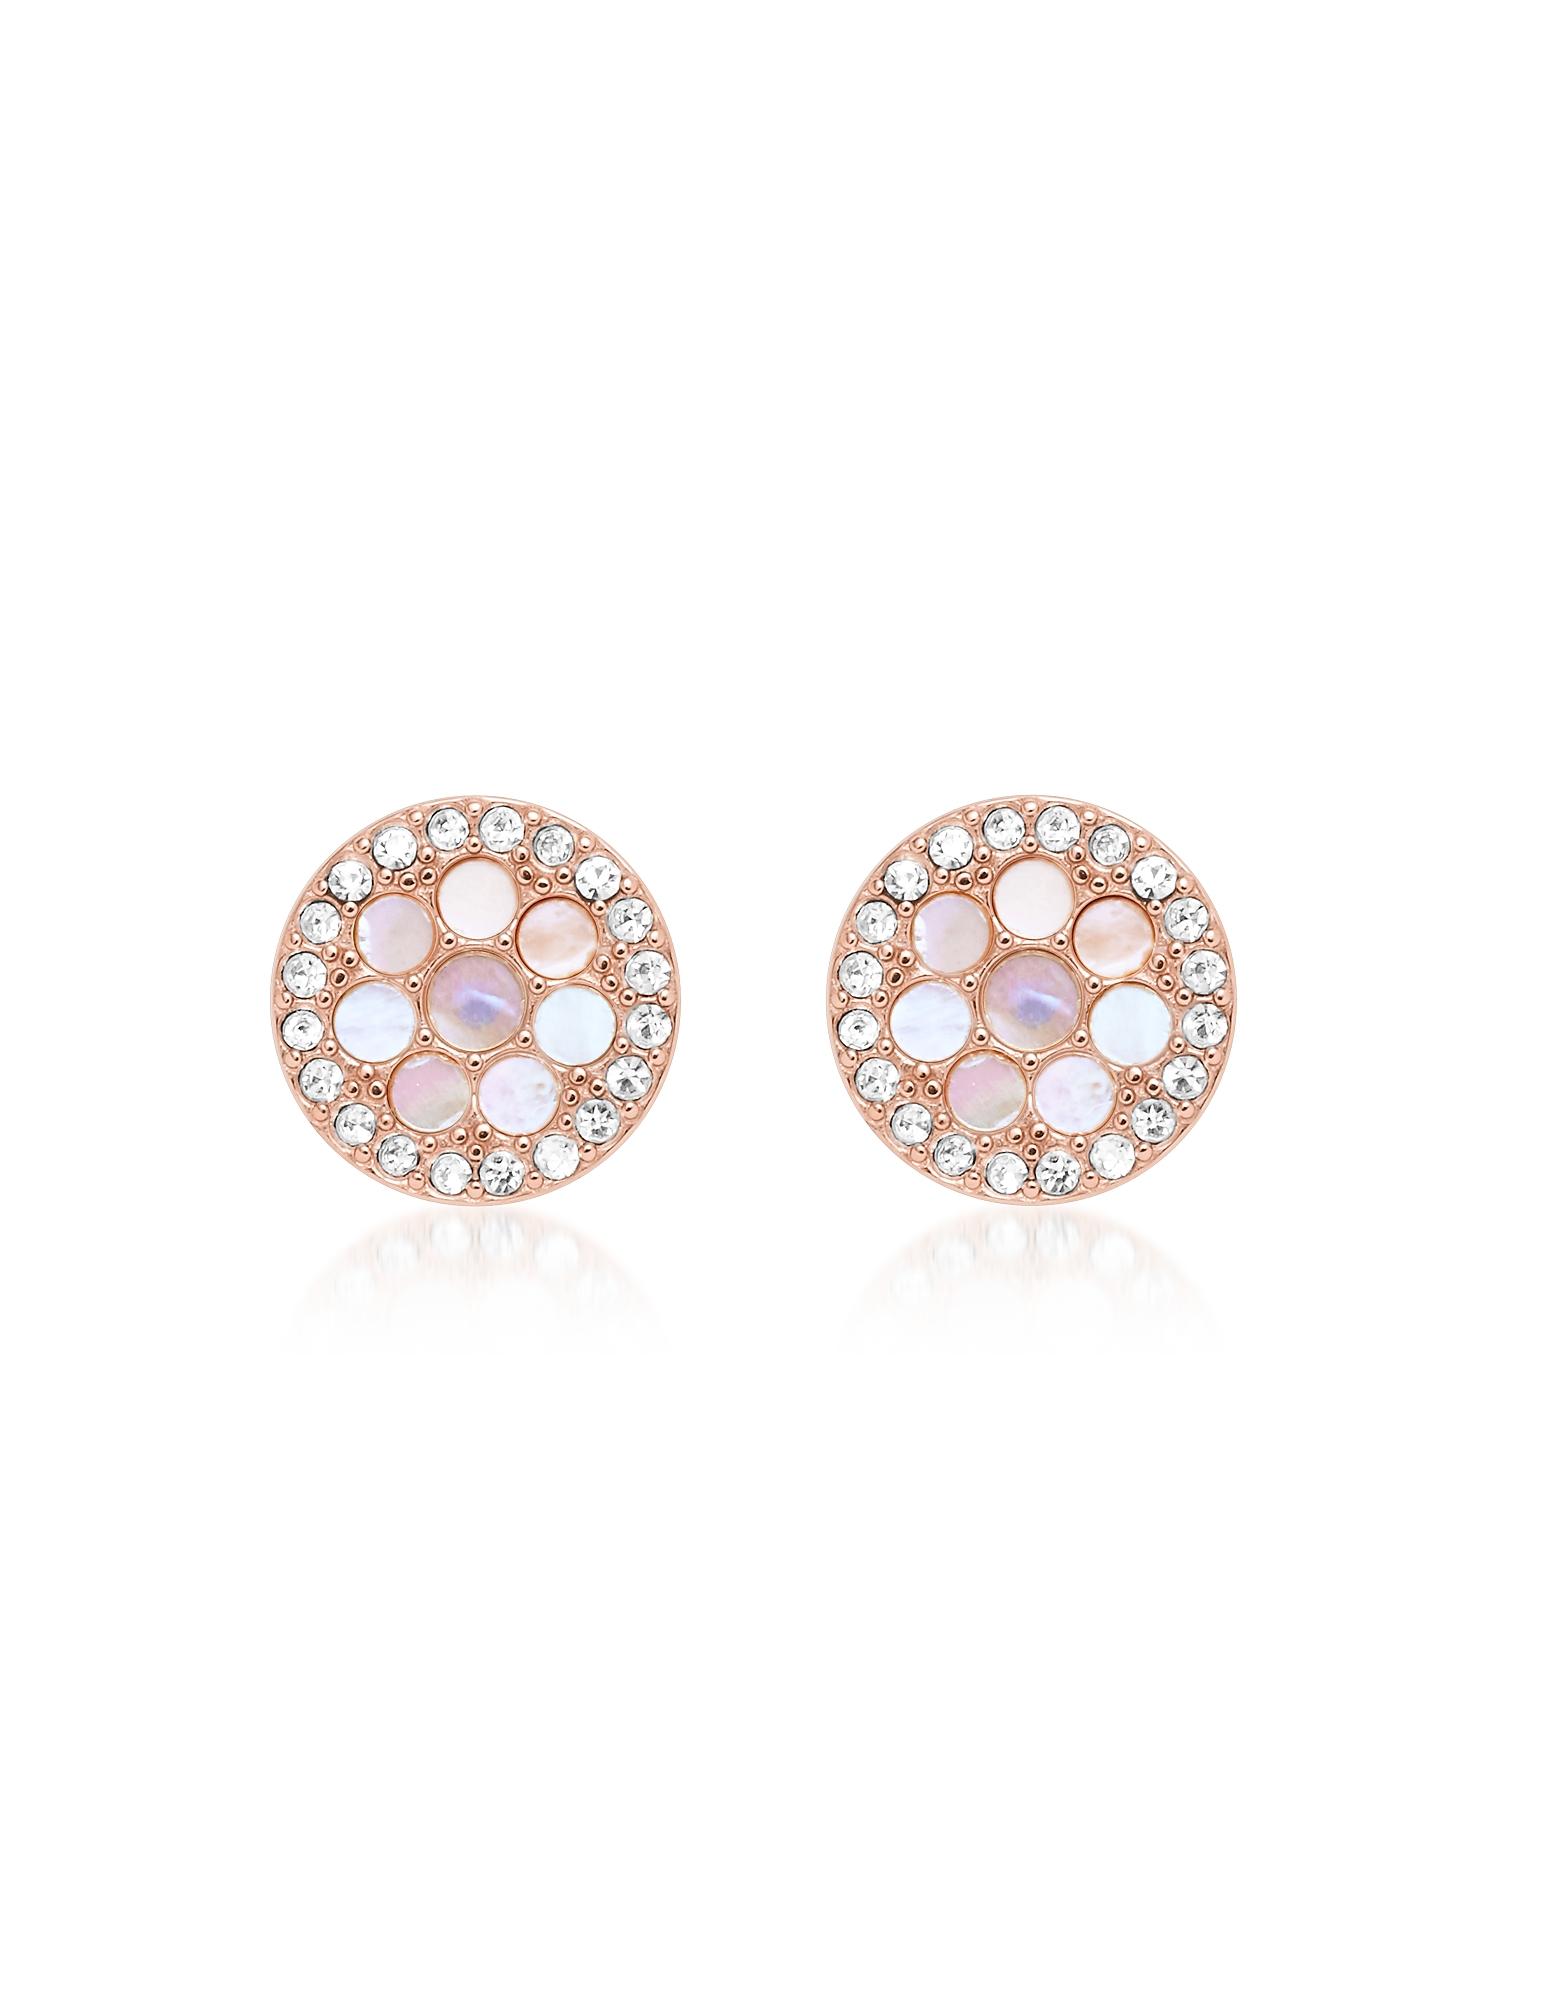 Vintage Glitz Rose Gold Tone Studs Earrings